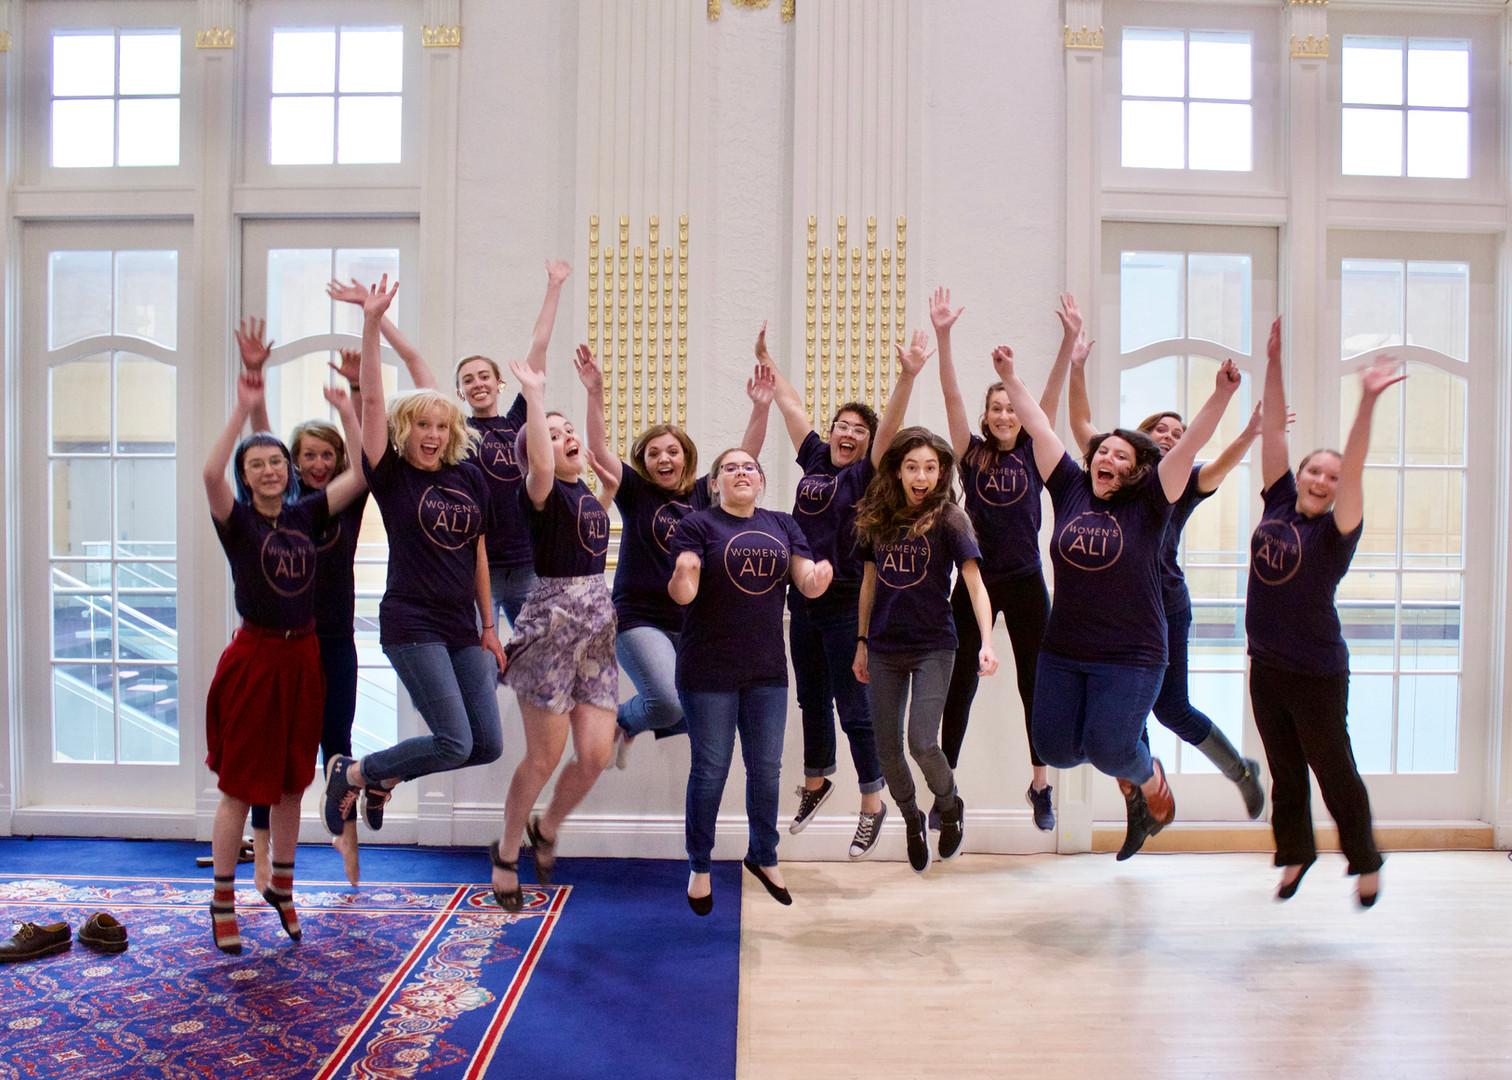 Women's ALI Fellows